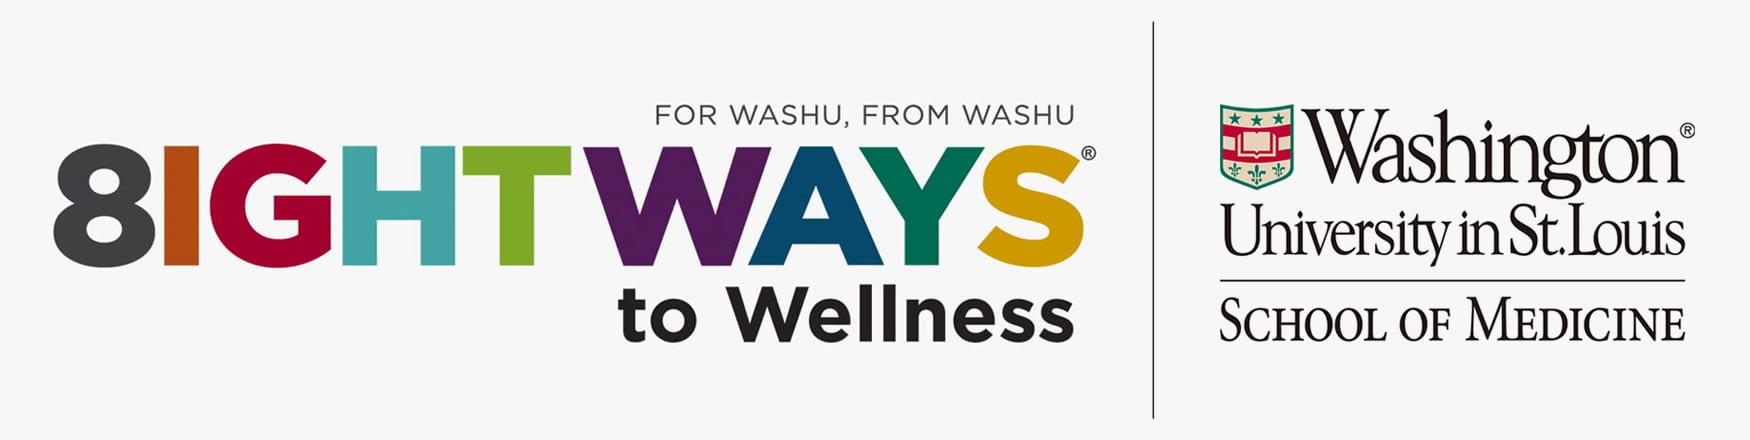 8ight Ways to Wellness